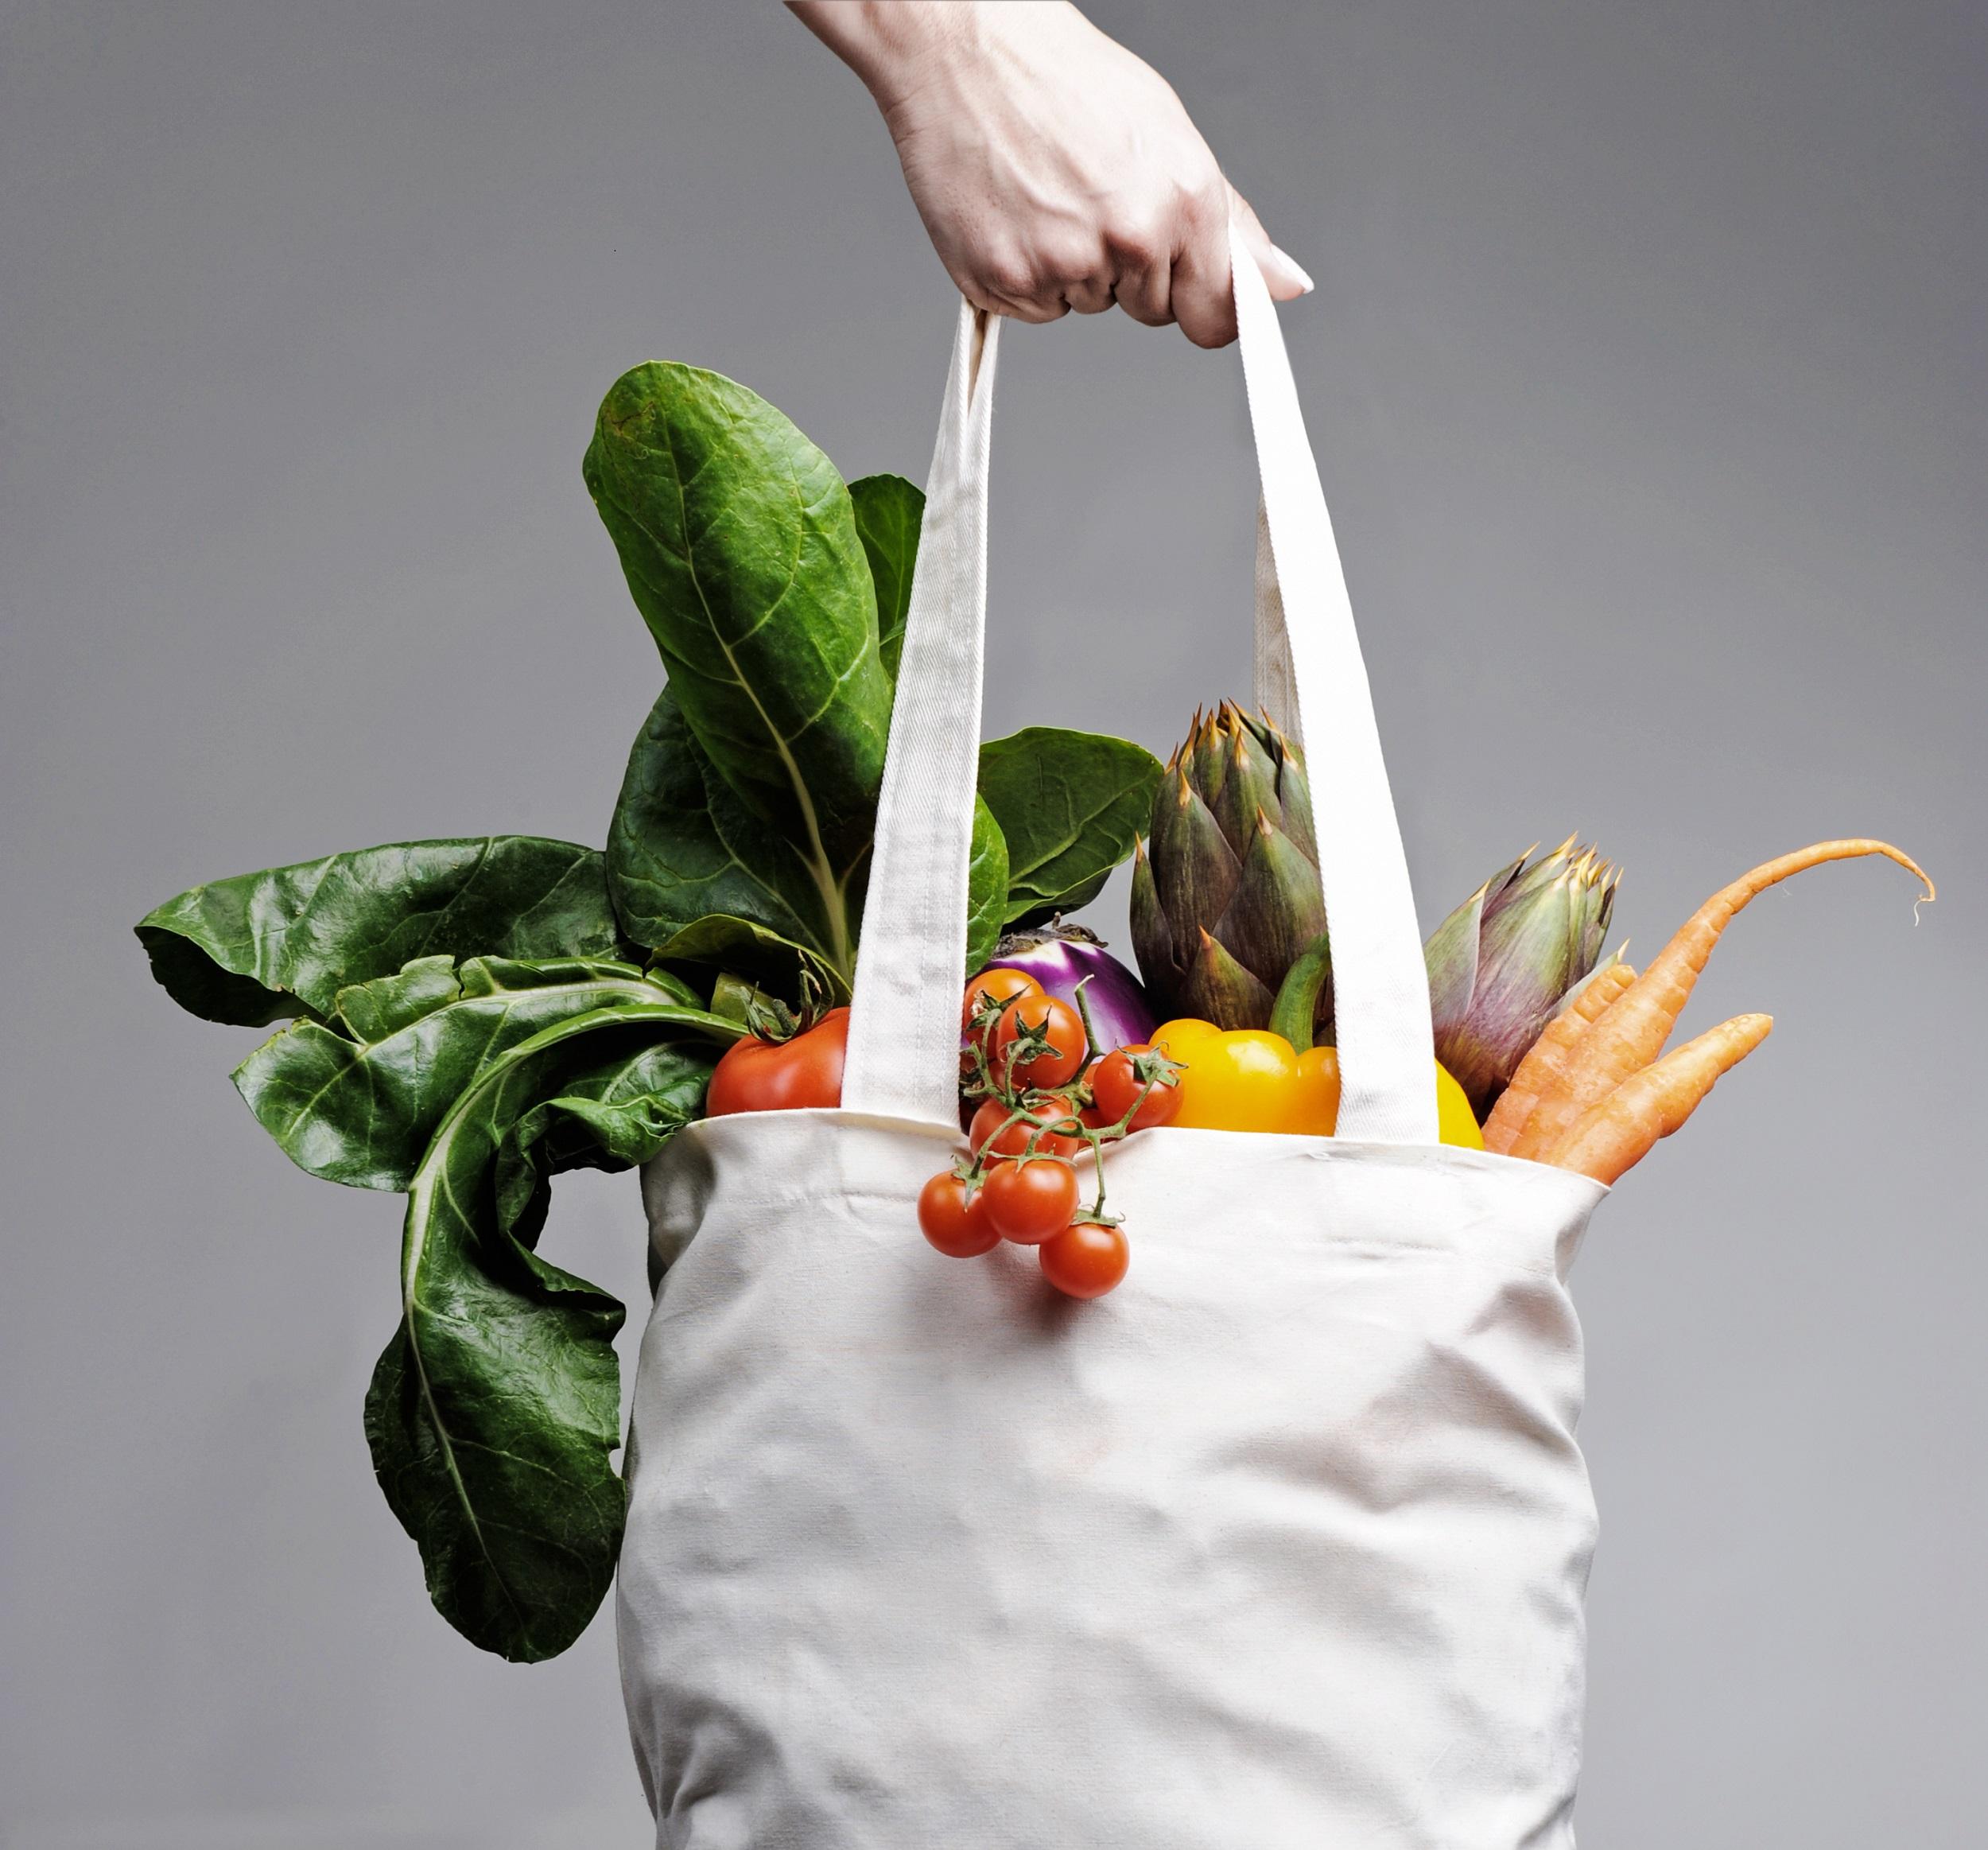 Laga mat av hemodlat